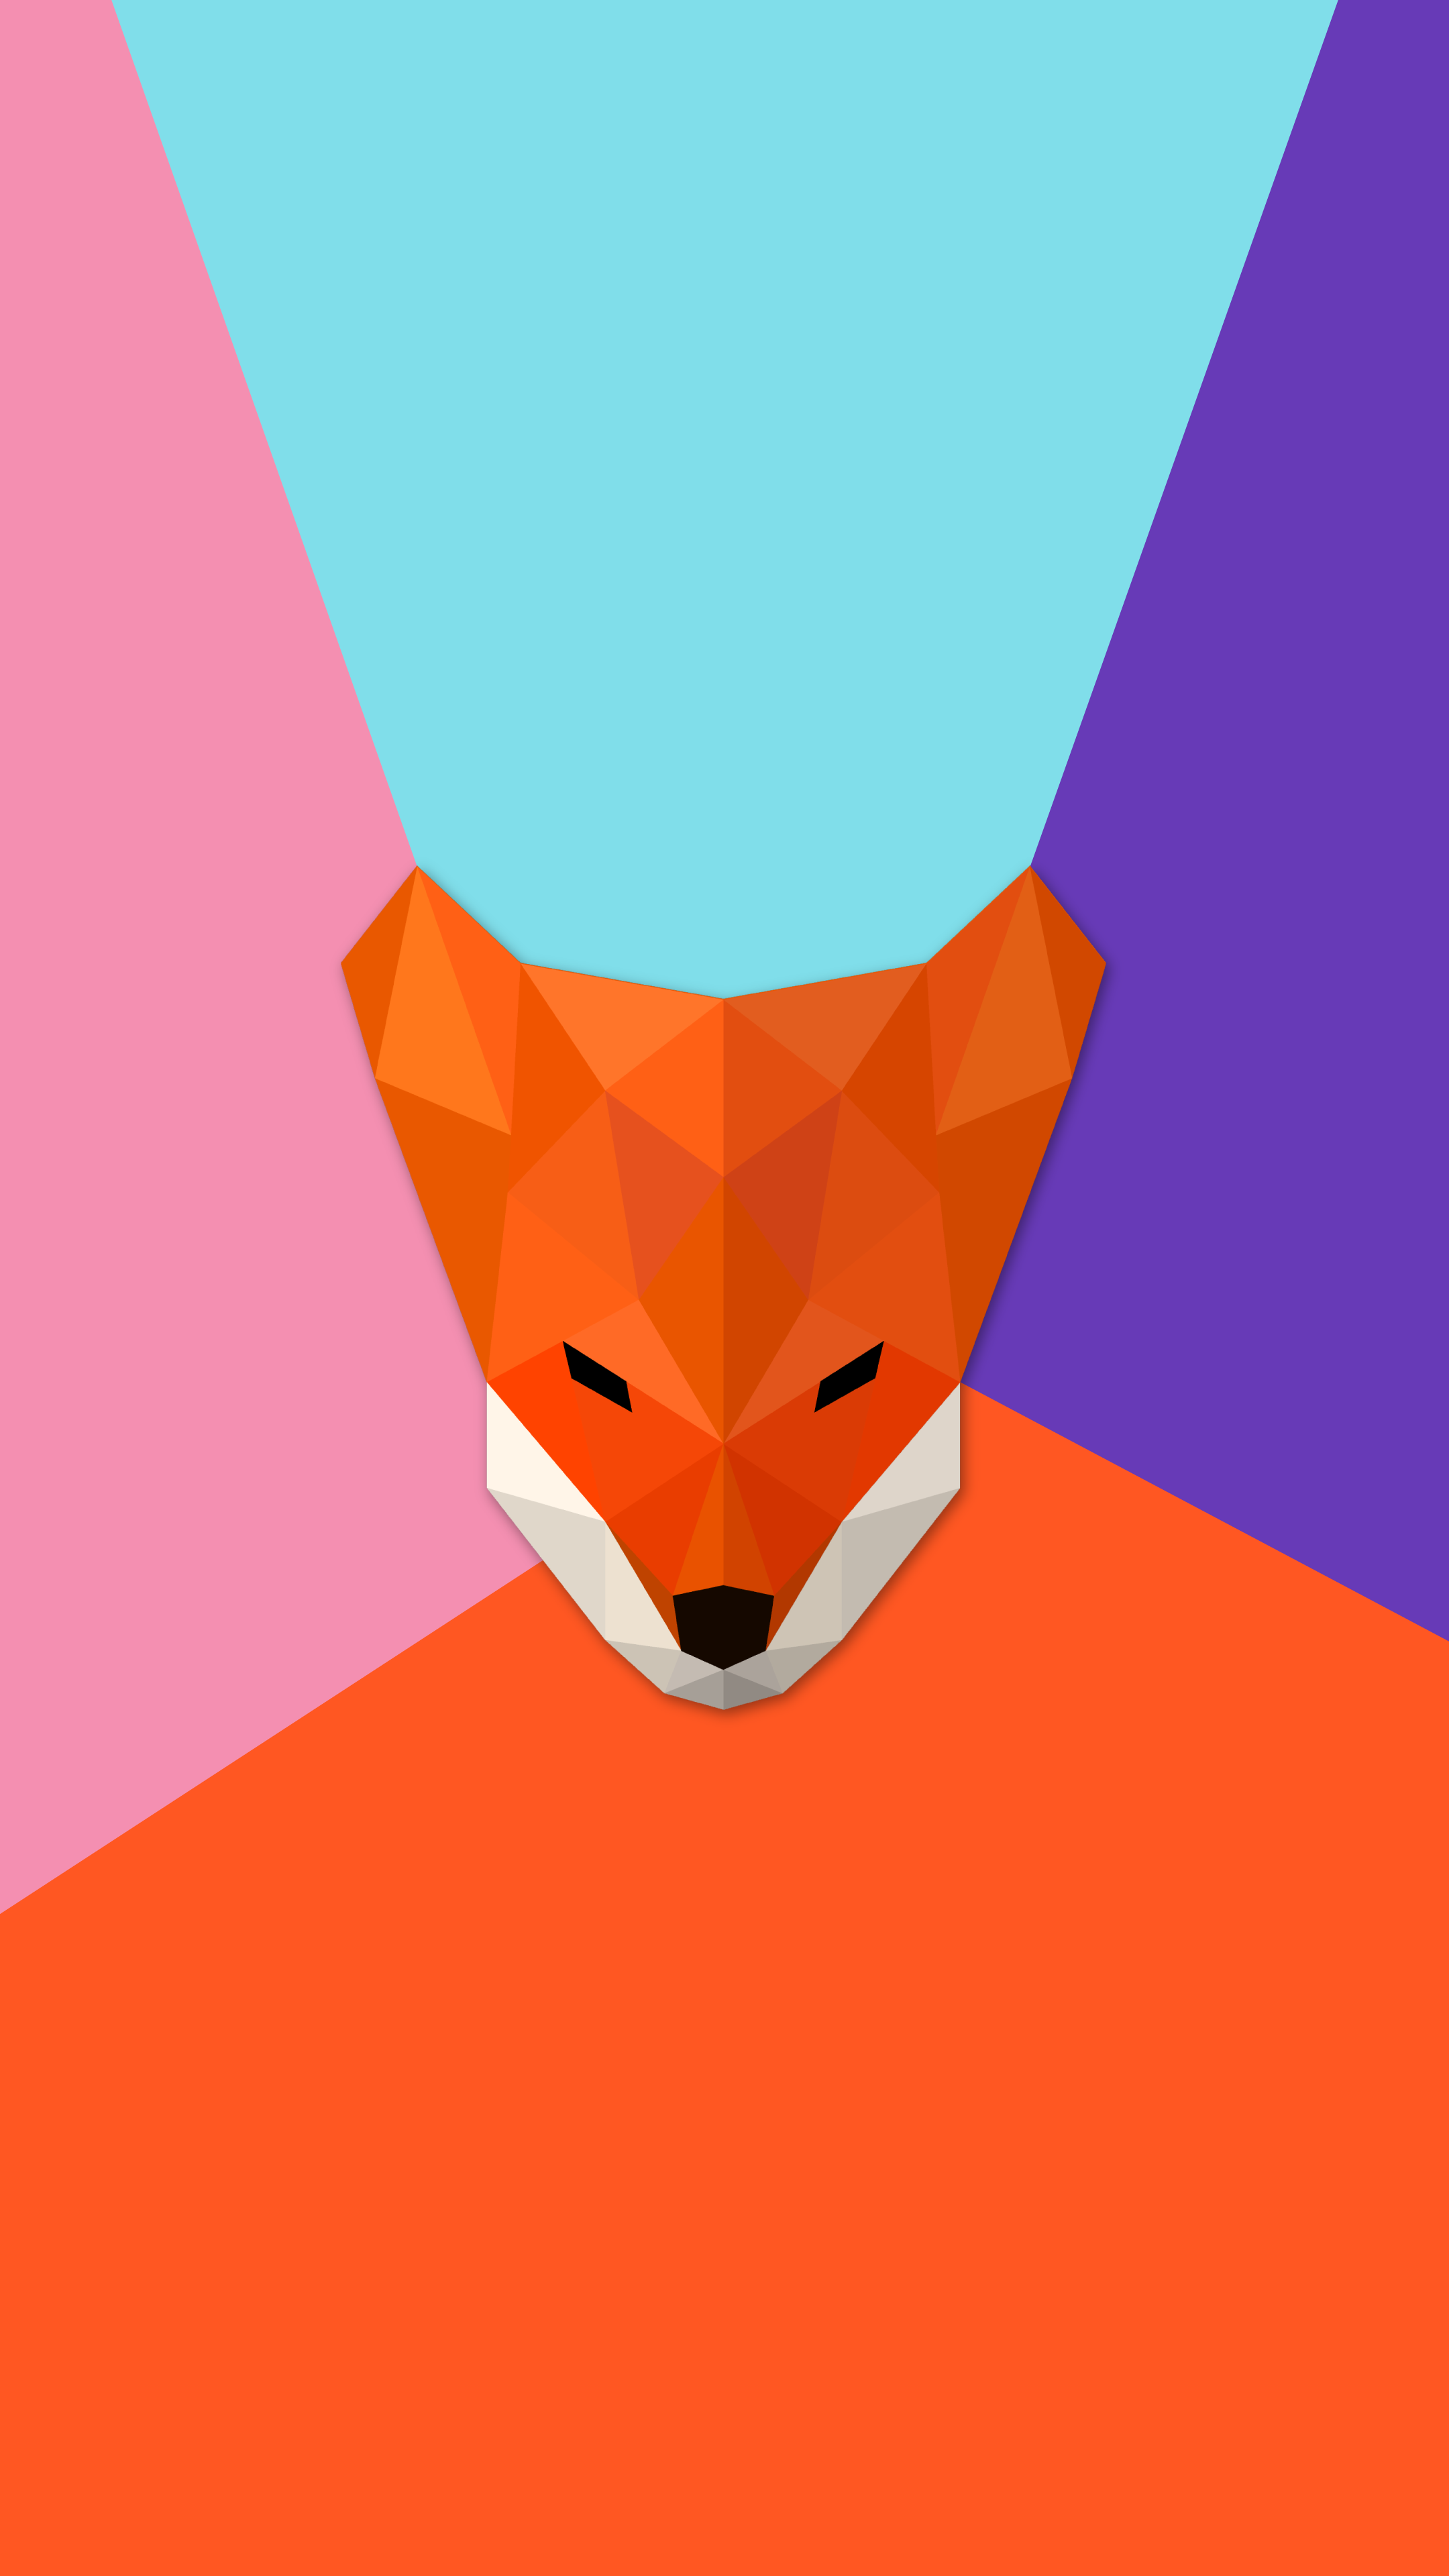 Fox Smart Phone Wallpapers 4kphonewallpapersreddit